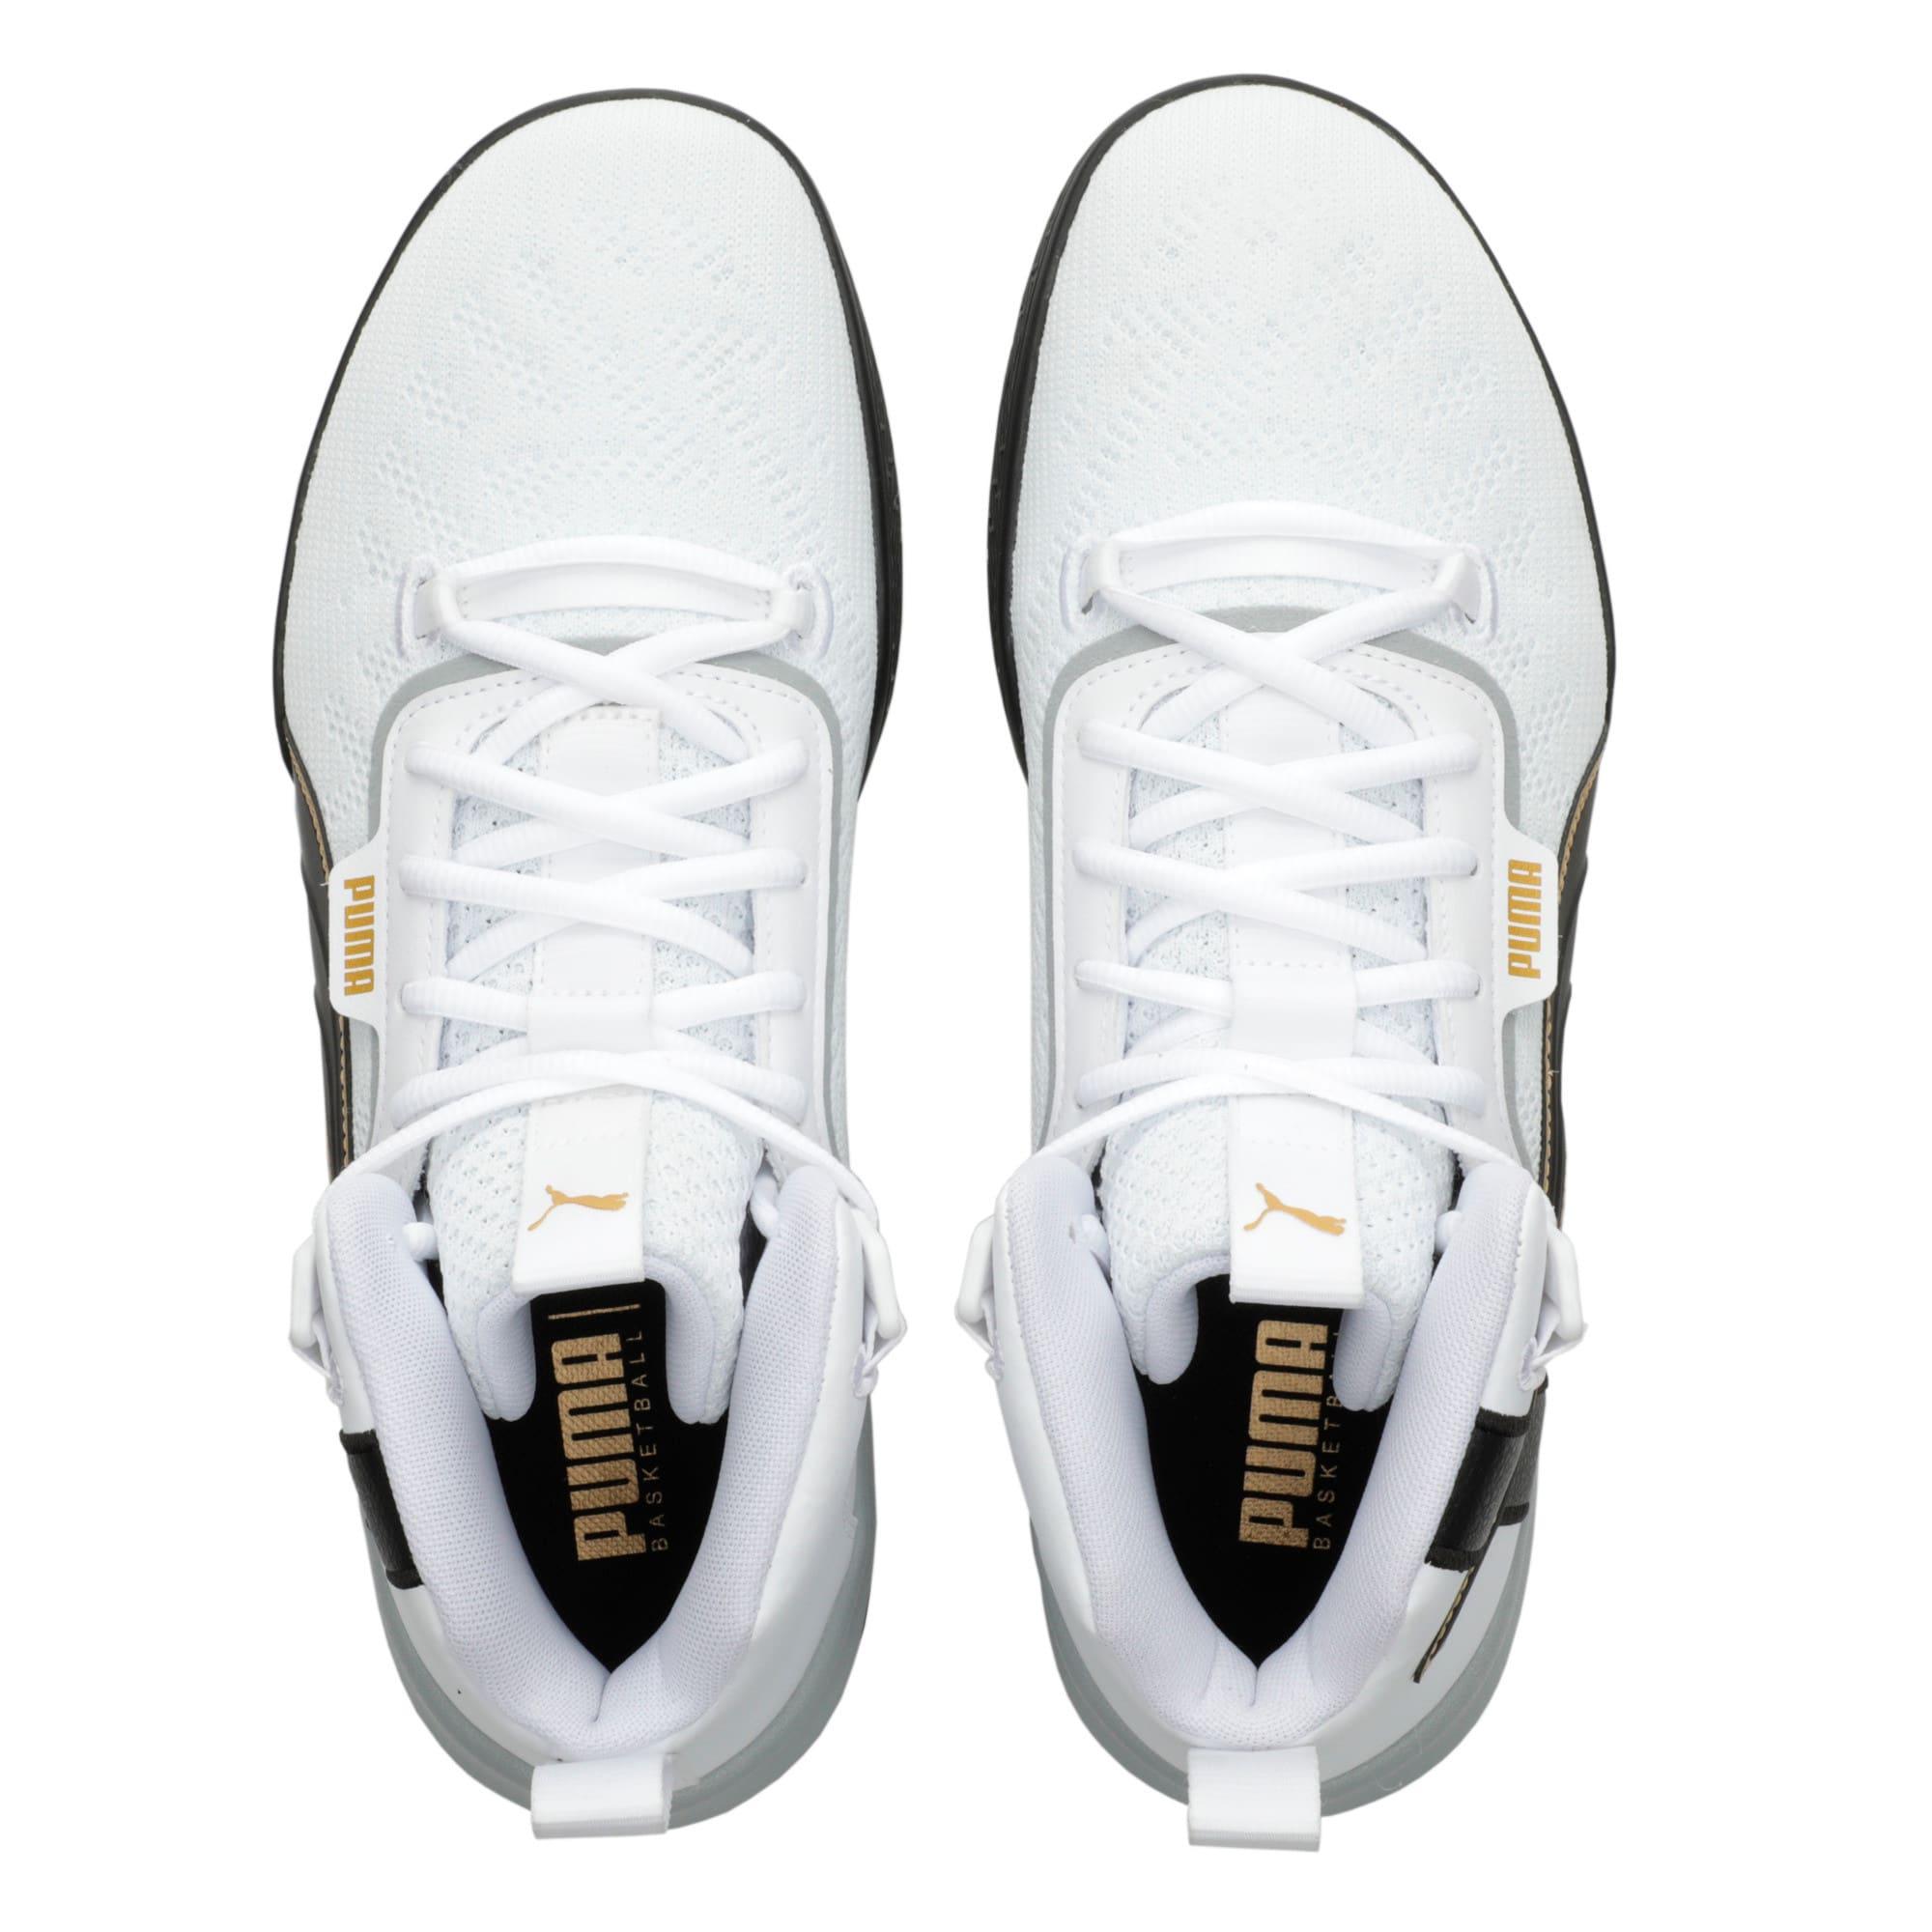 Thumbnail 6 of Legacy '68 Basketball Shoes, Puma Black-Puma White, medium-IND